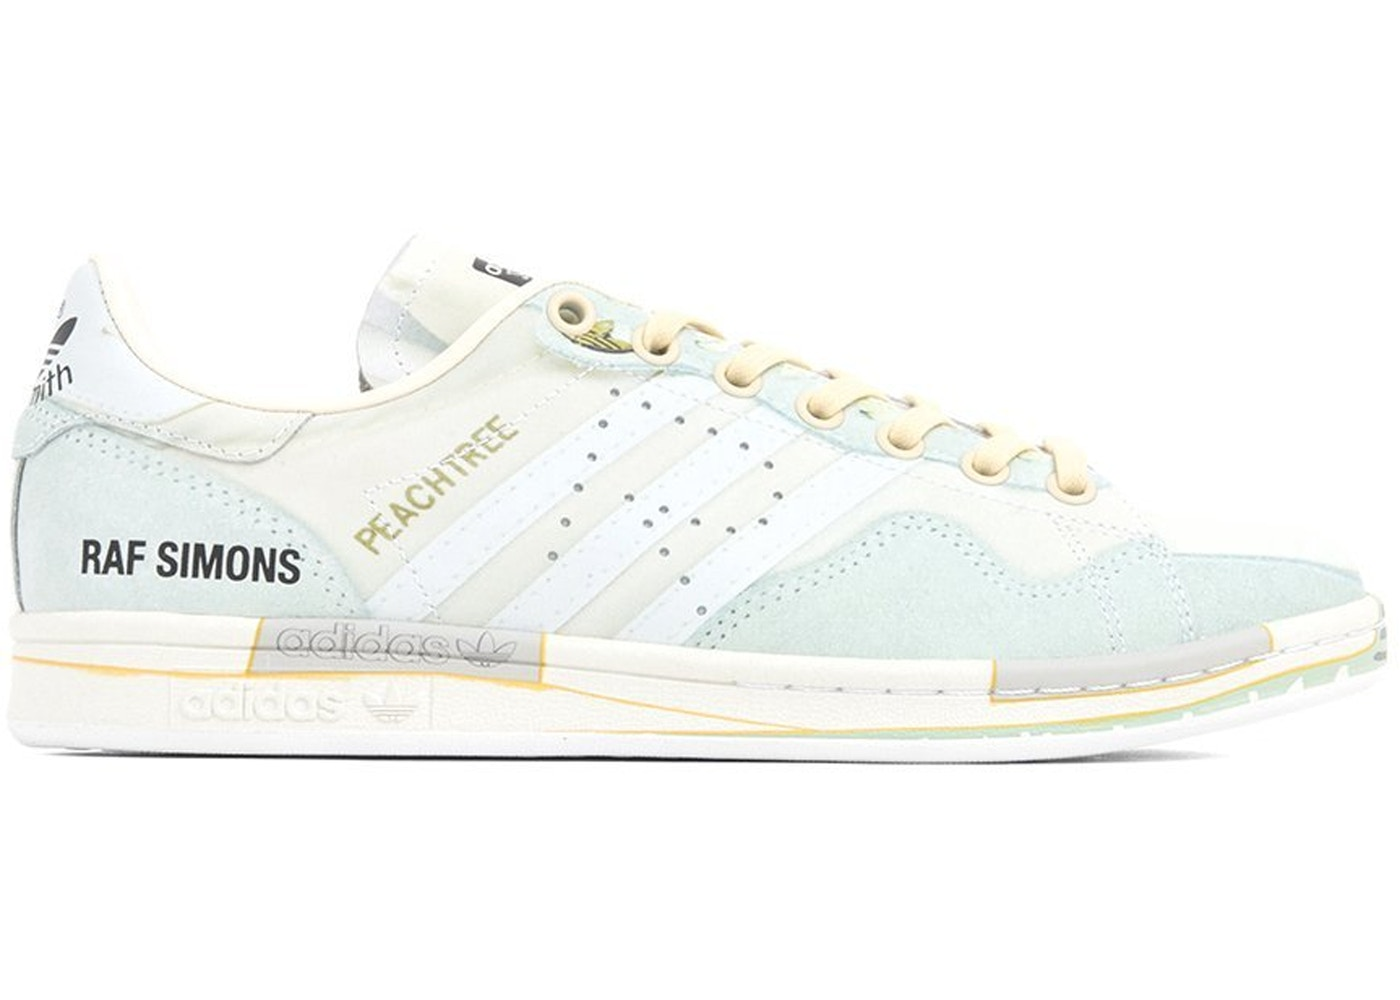 Adidas x Raf Simons Peach Stan